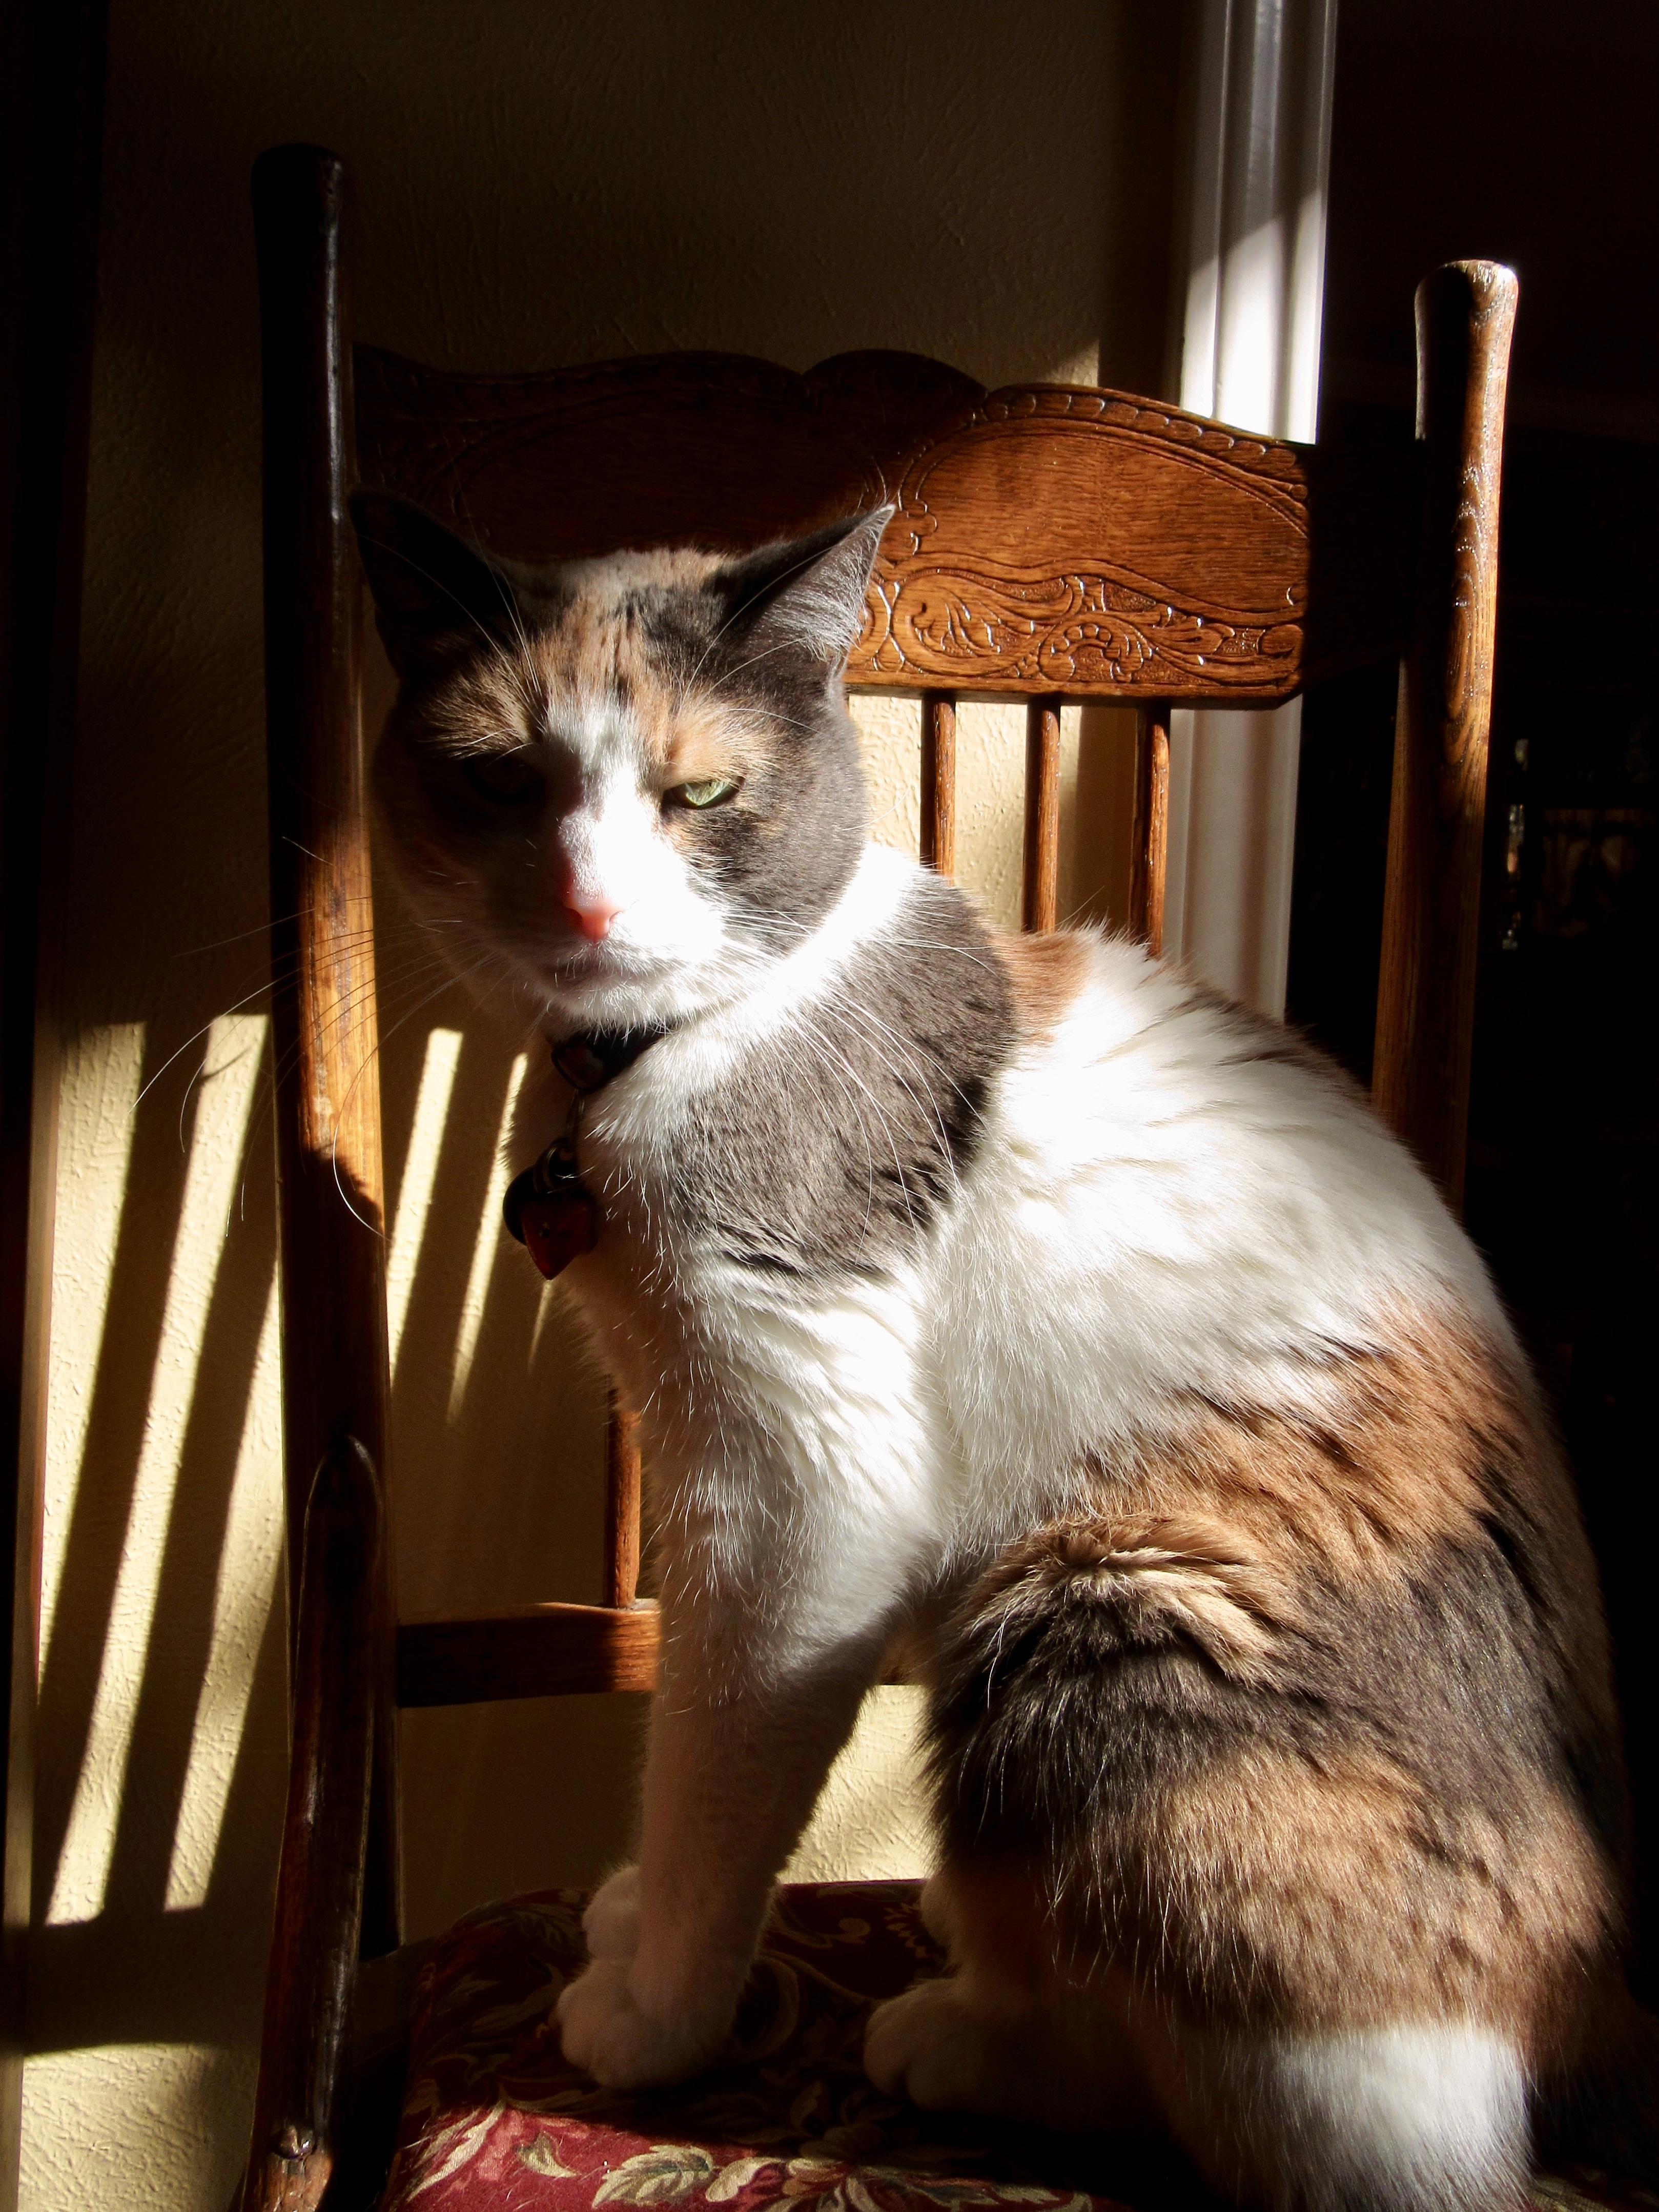 Two Cat Haiku: Made Thoughtful by Sunlight